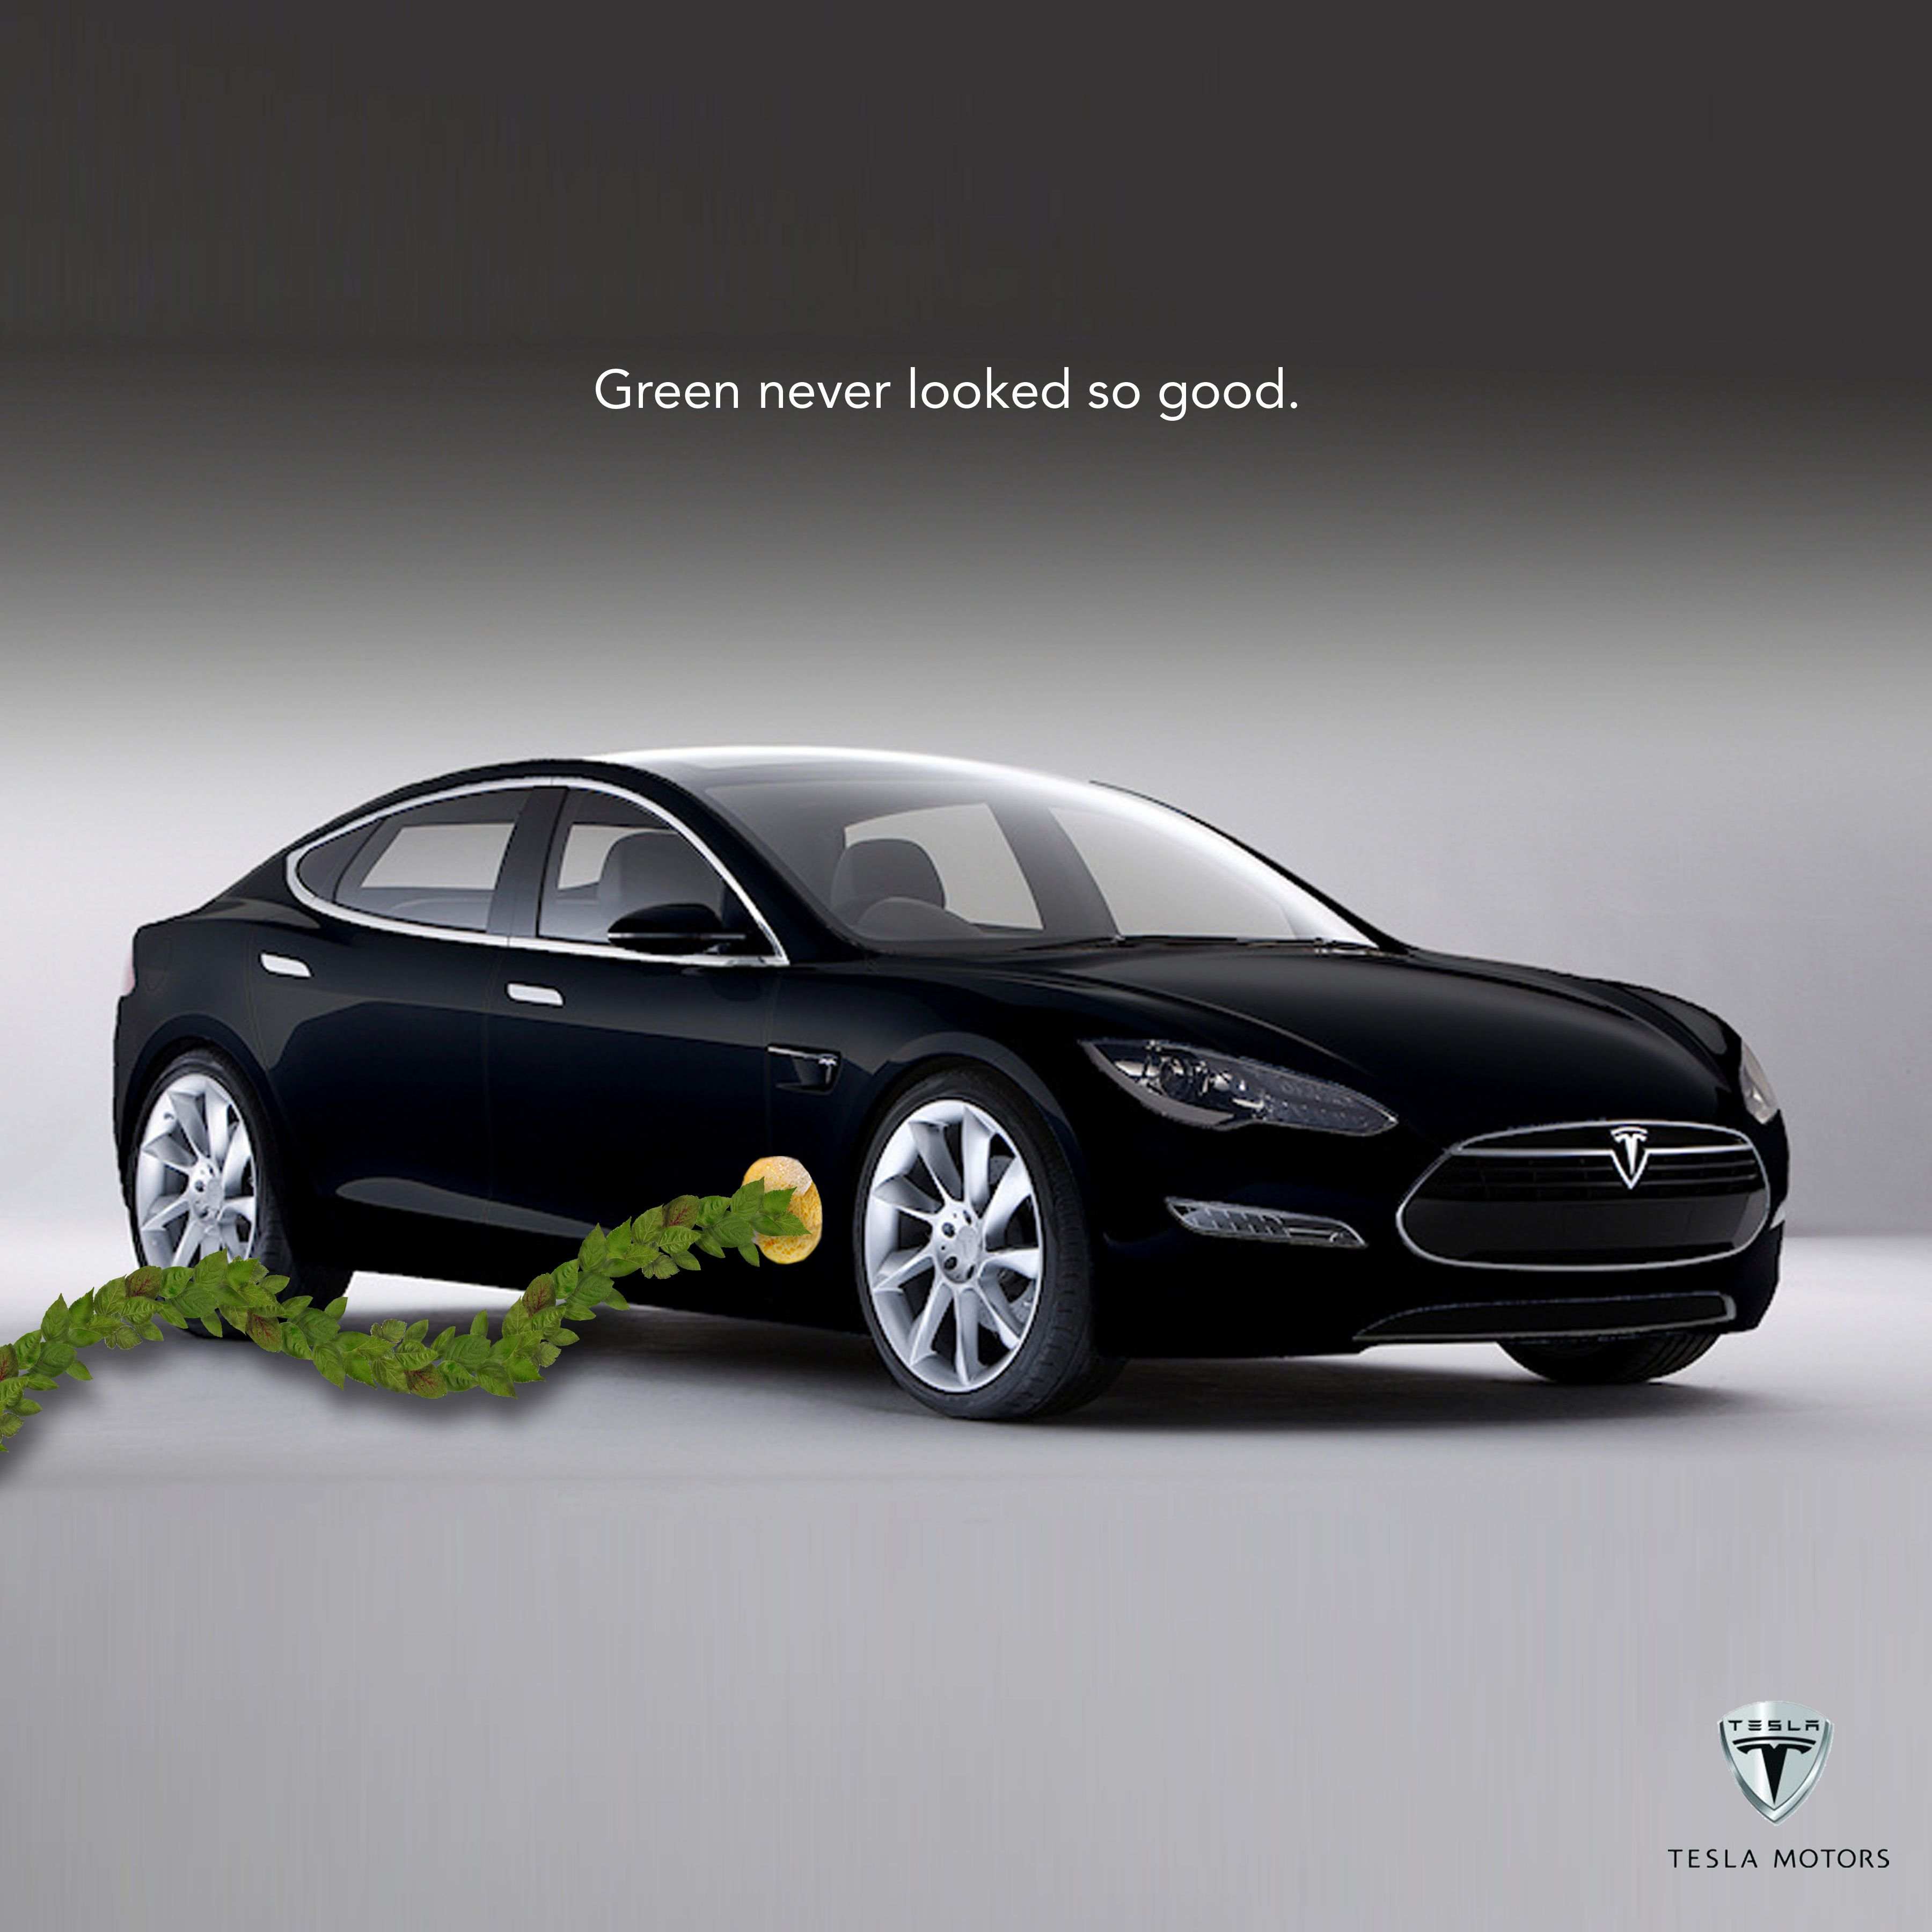 Posts About Advertising On Car Advertising Design Car Print Ads Tesla Car [ 3600 x 3600 Pixel ]